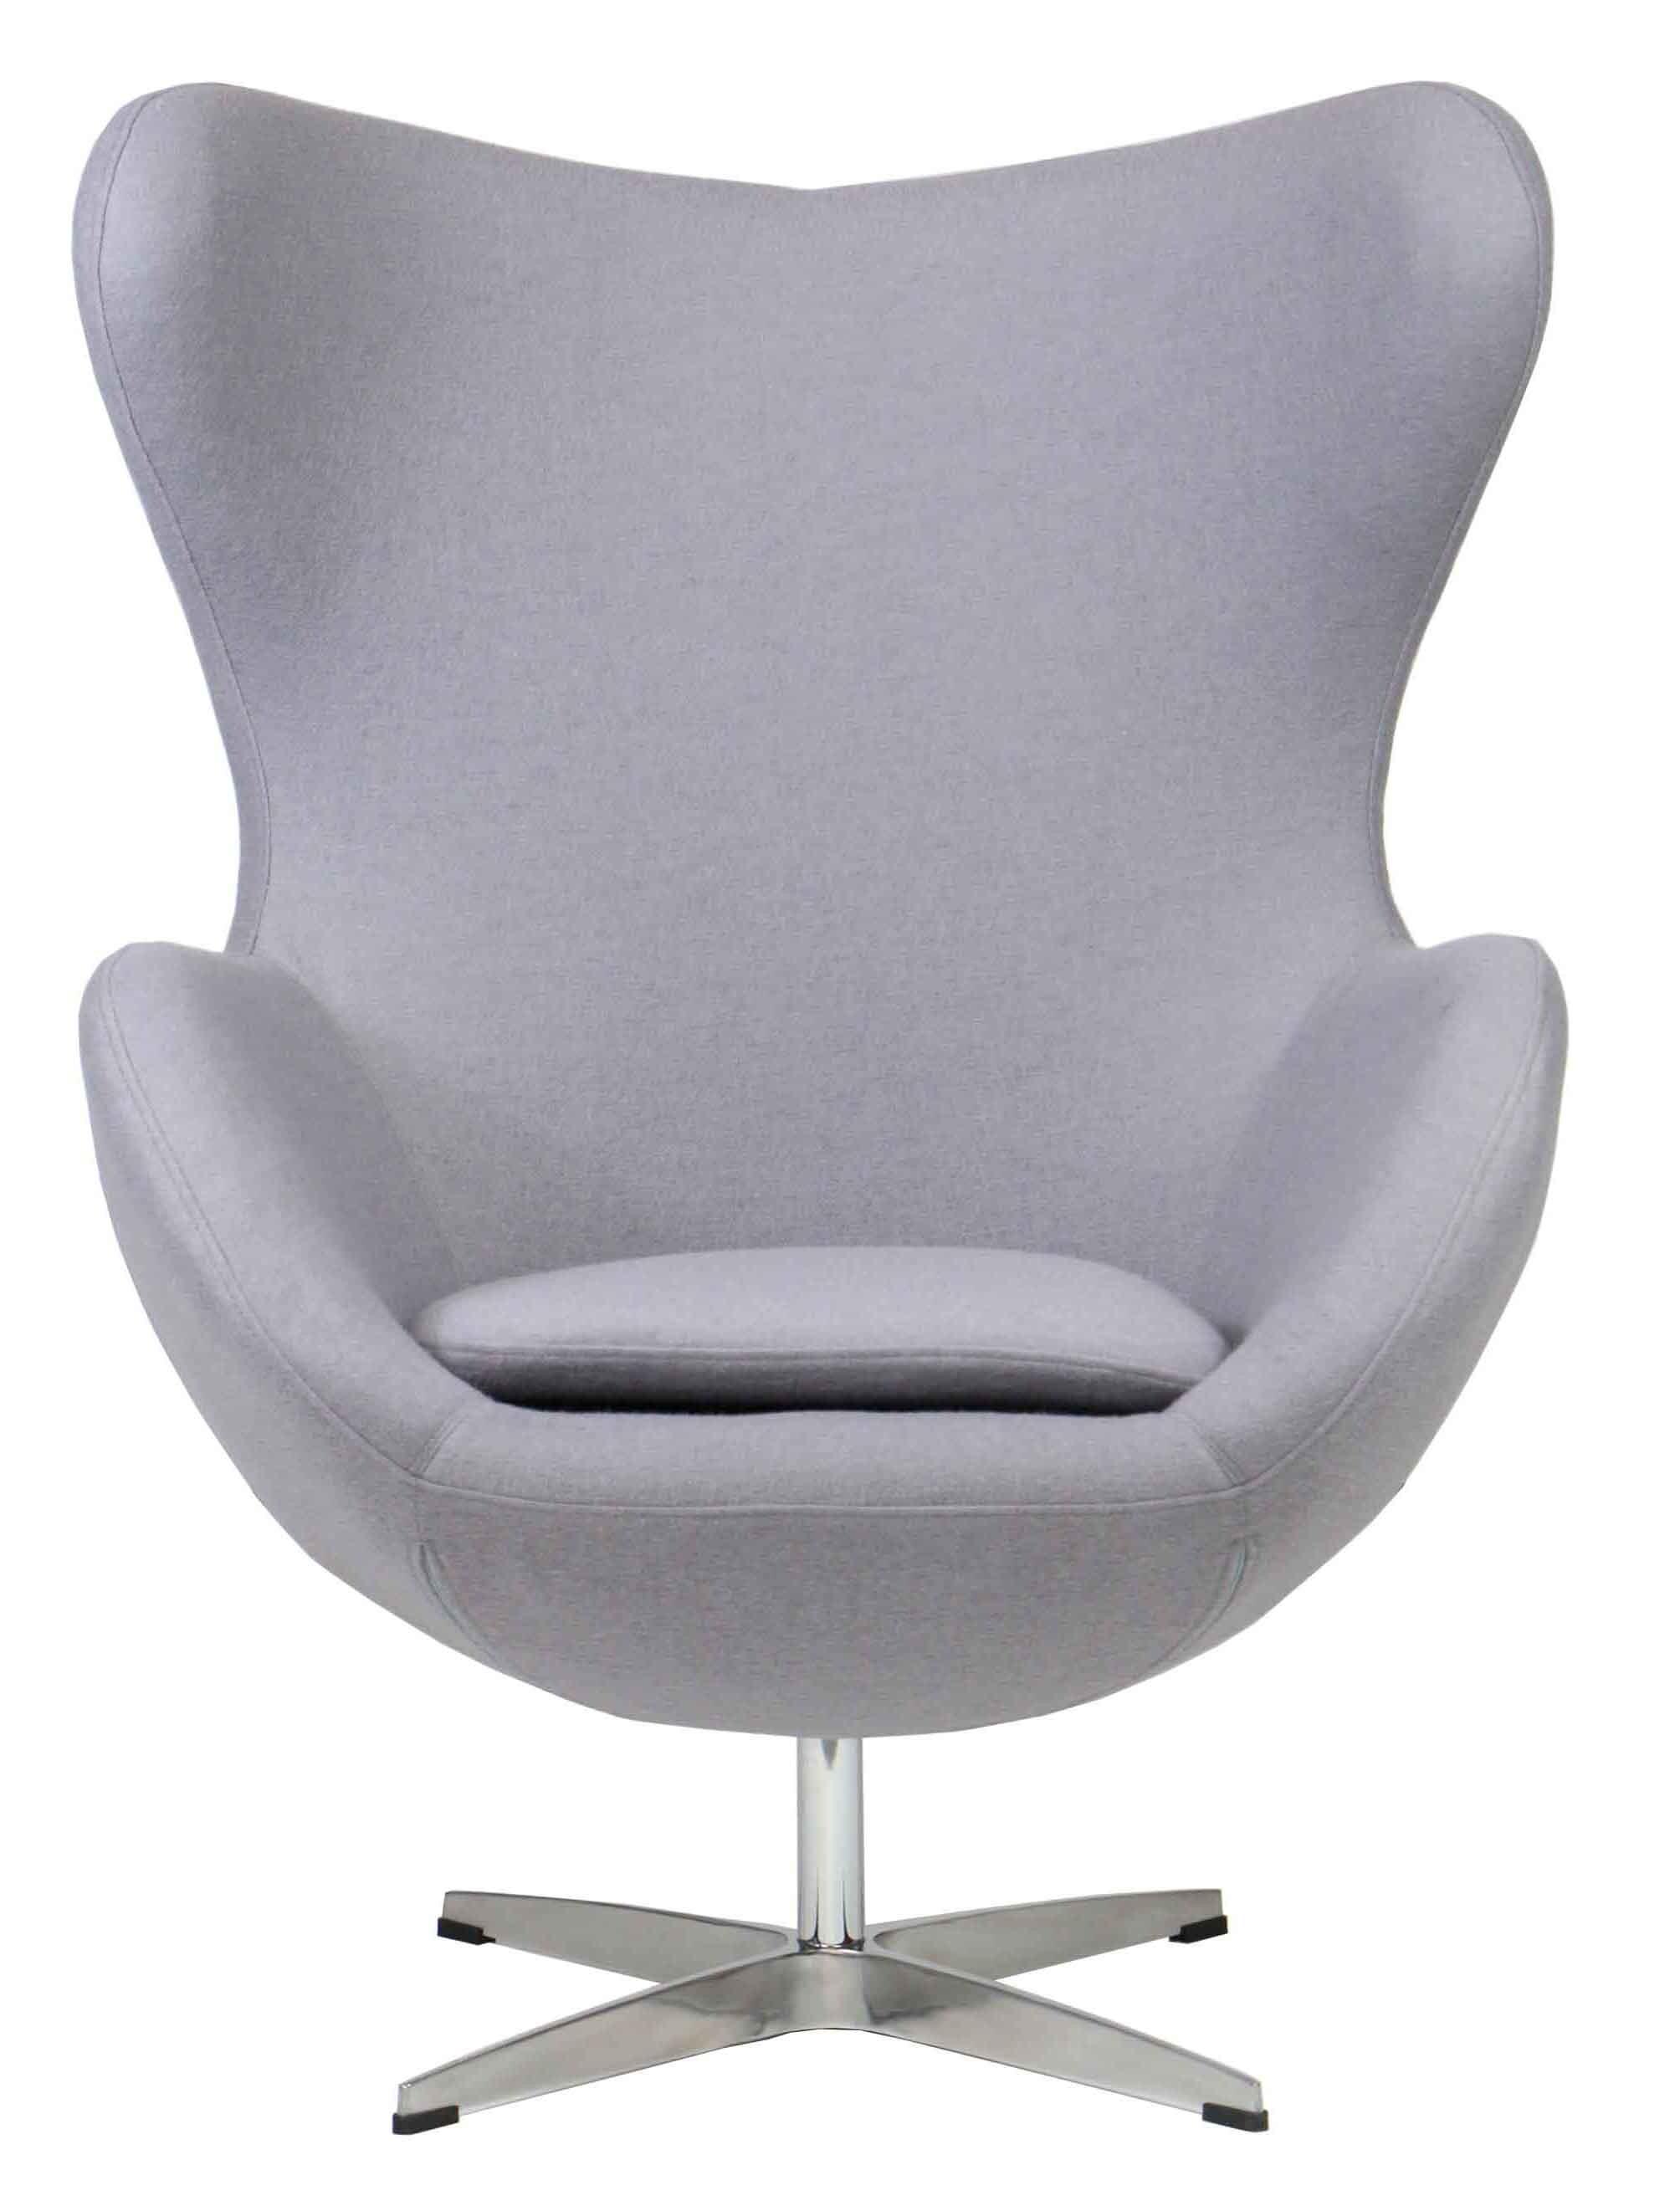 Designer Replica Egg Chair In Light Grey Furniture Home Décor